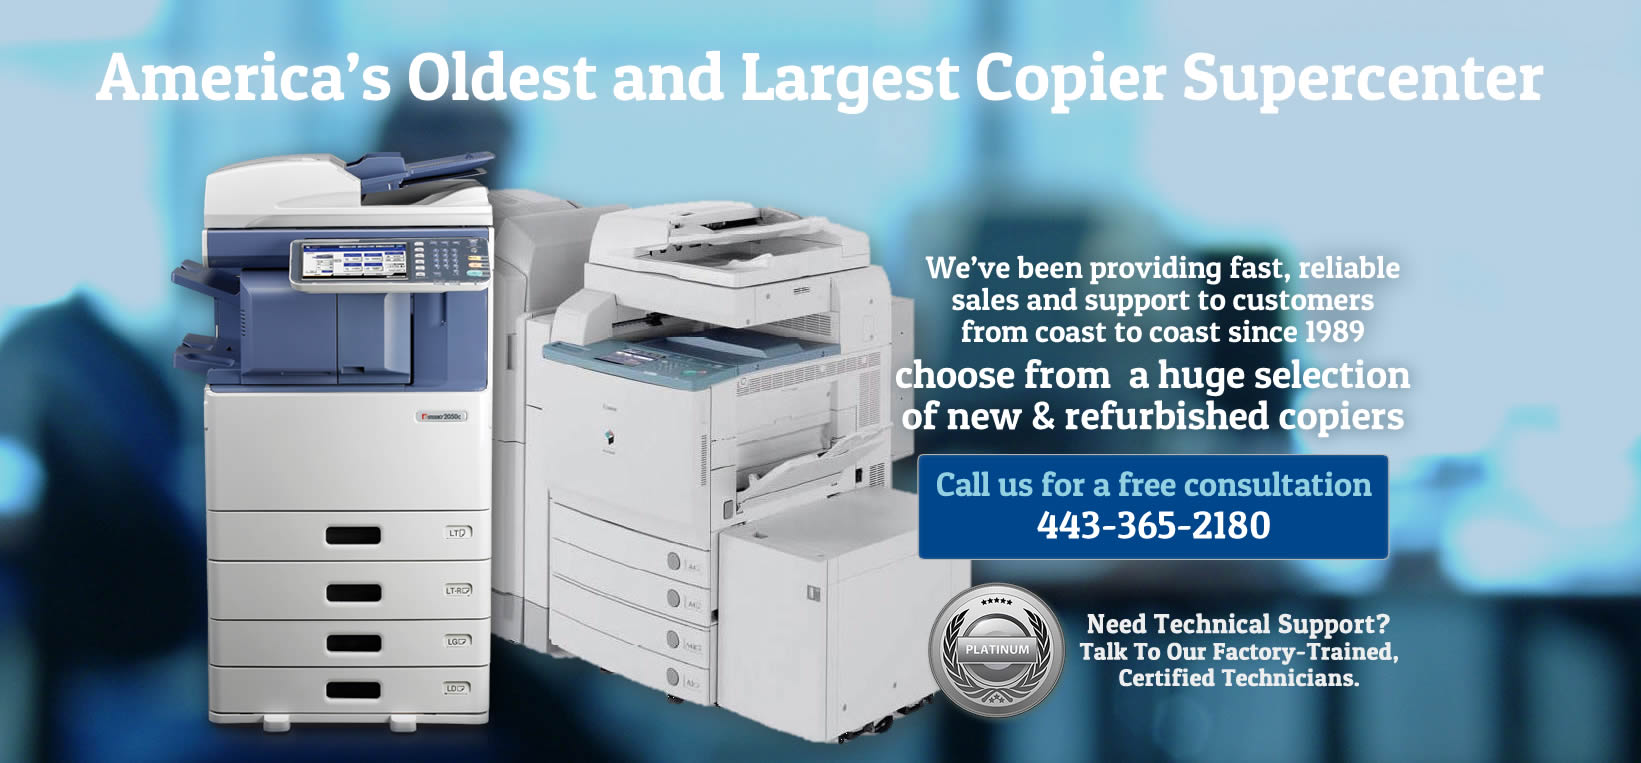 Refurbished Copier Supercenter